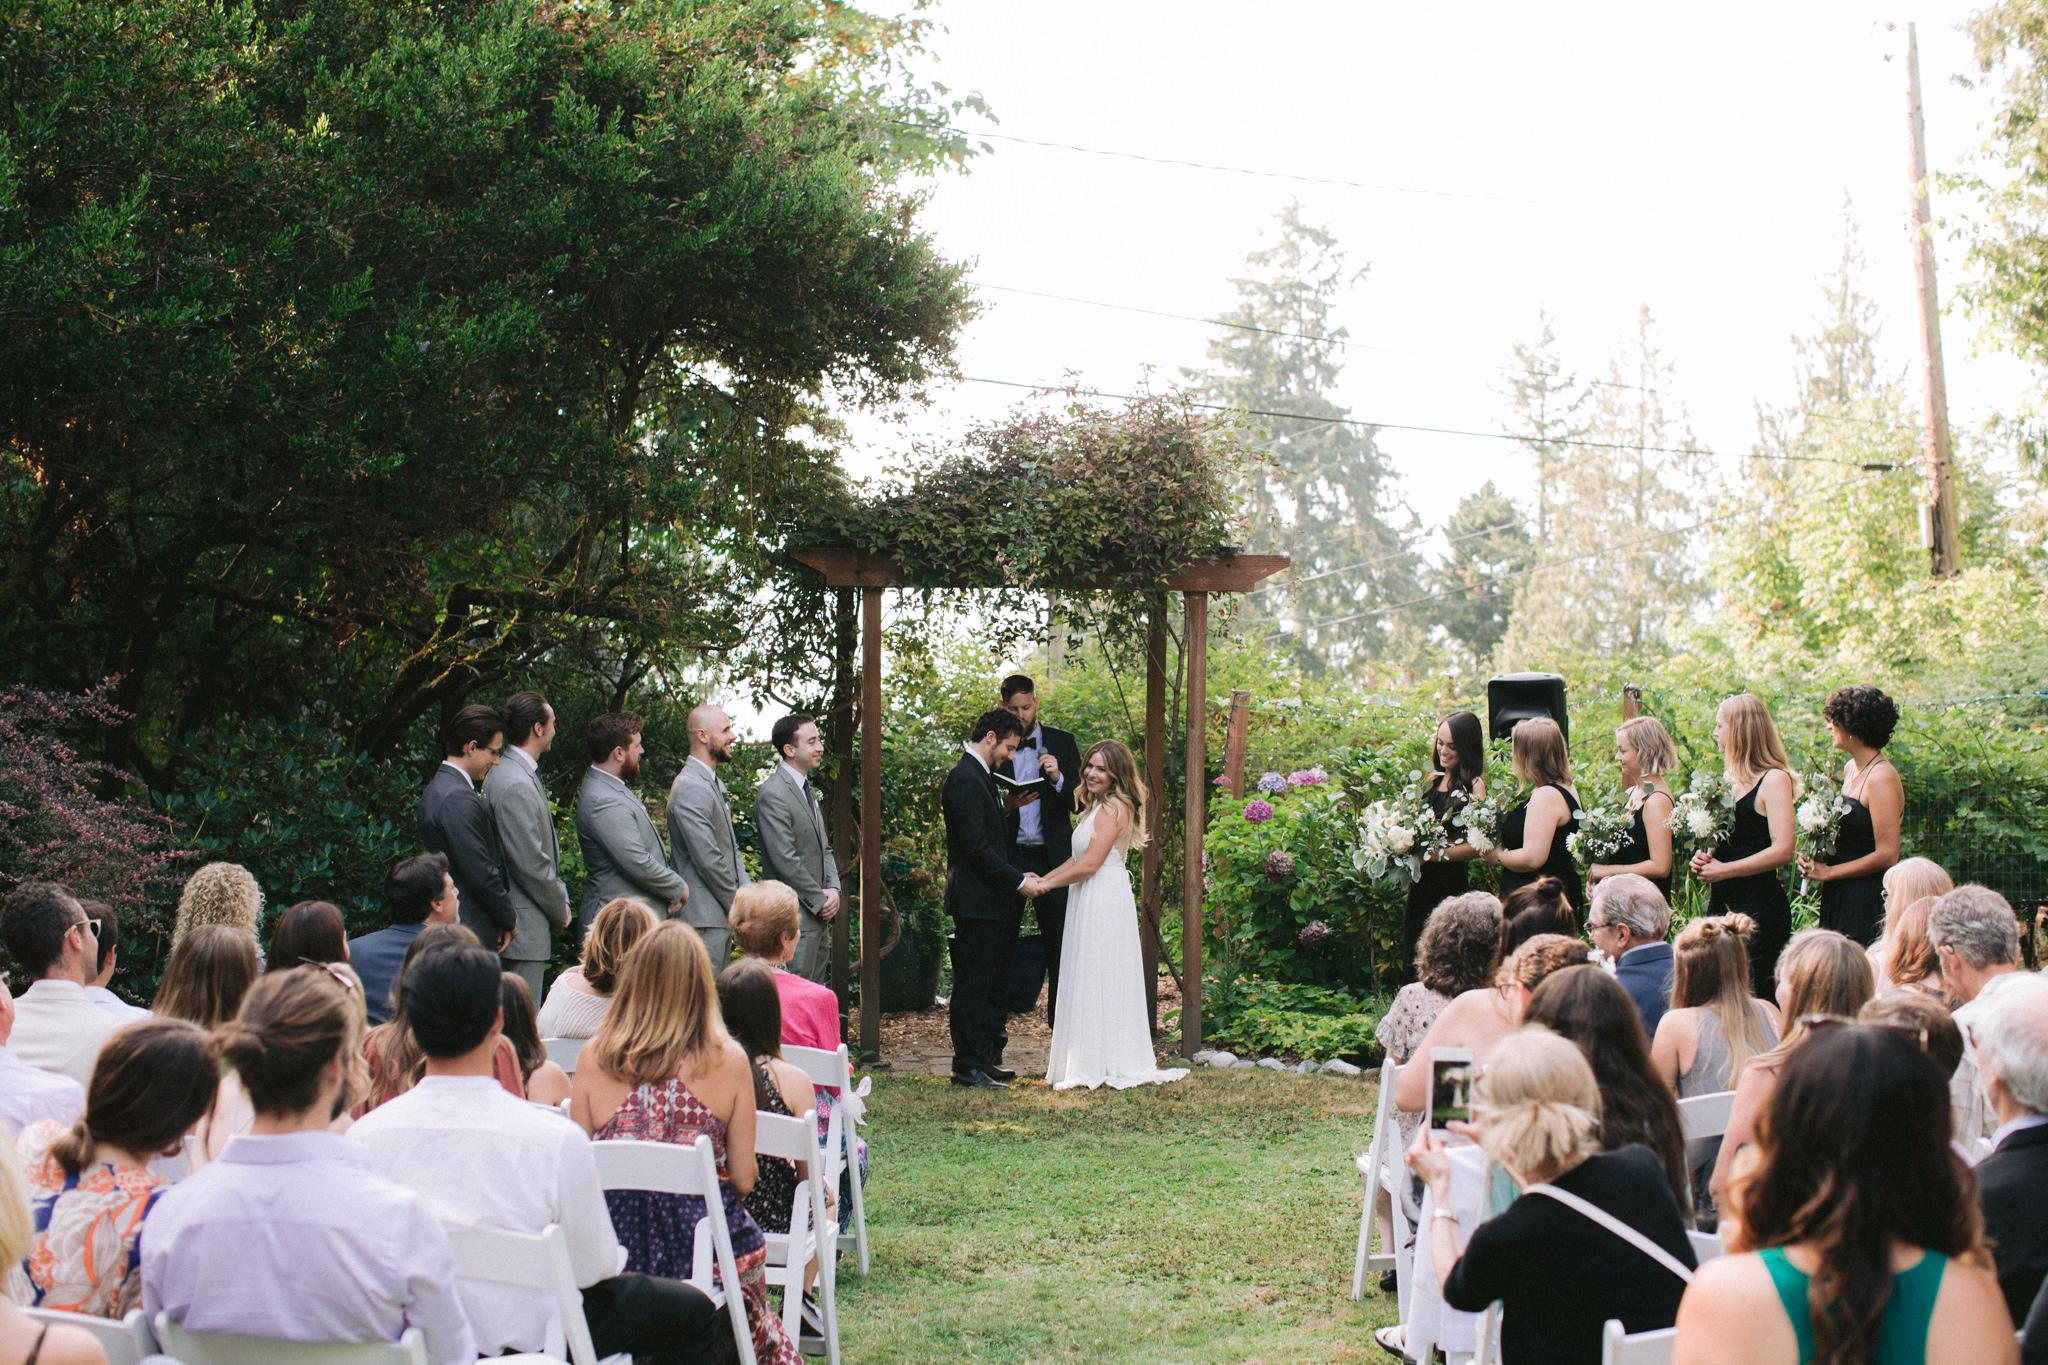 Backyard-Bainbridge-Island-Wedding-Alycia-Lovell-Photography-93.JPG